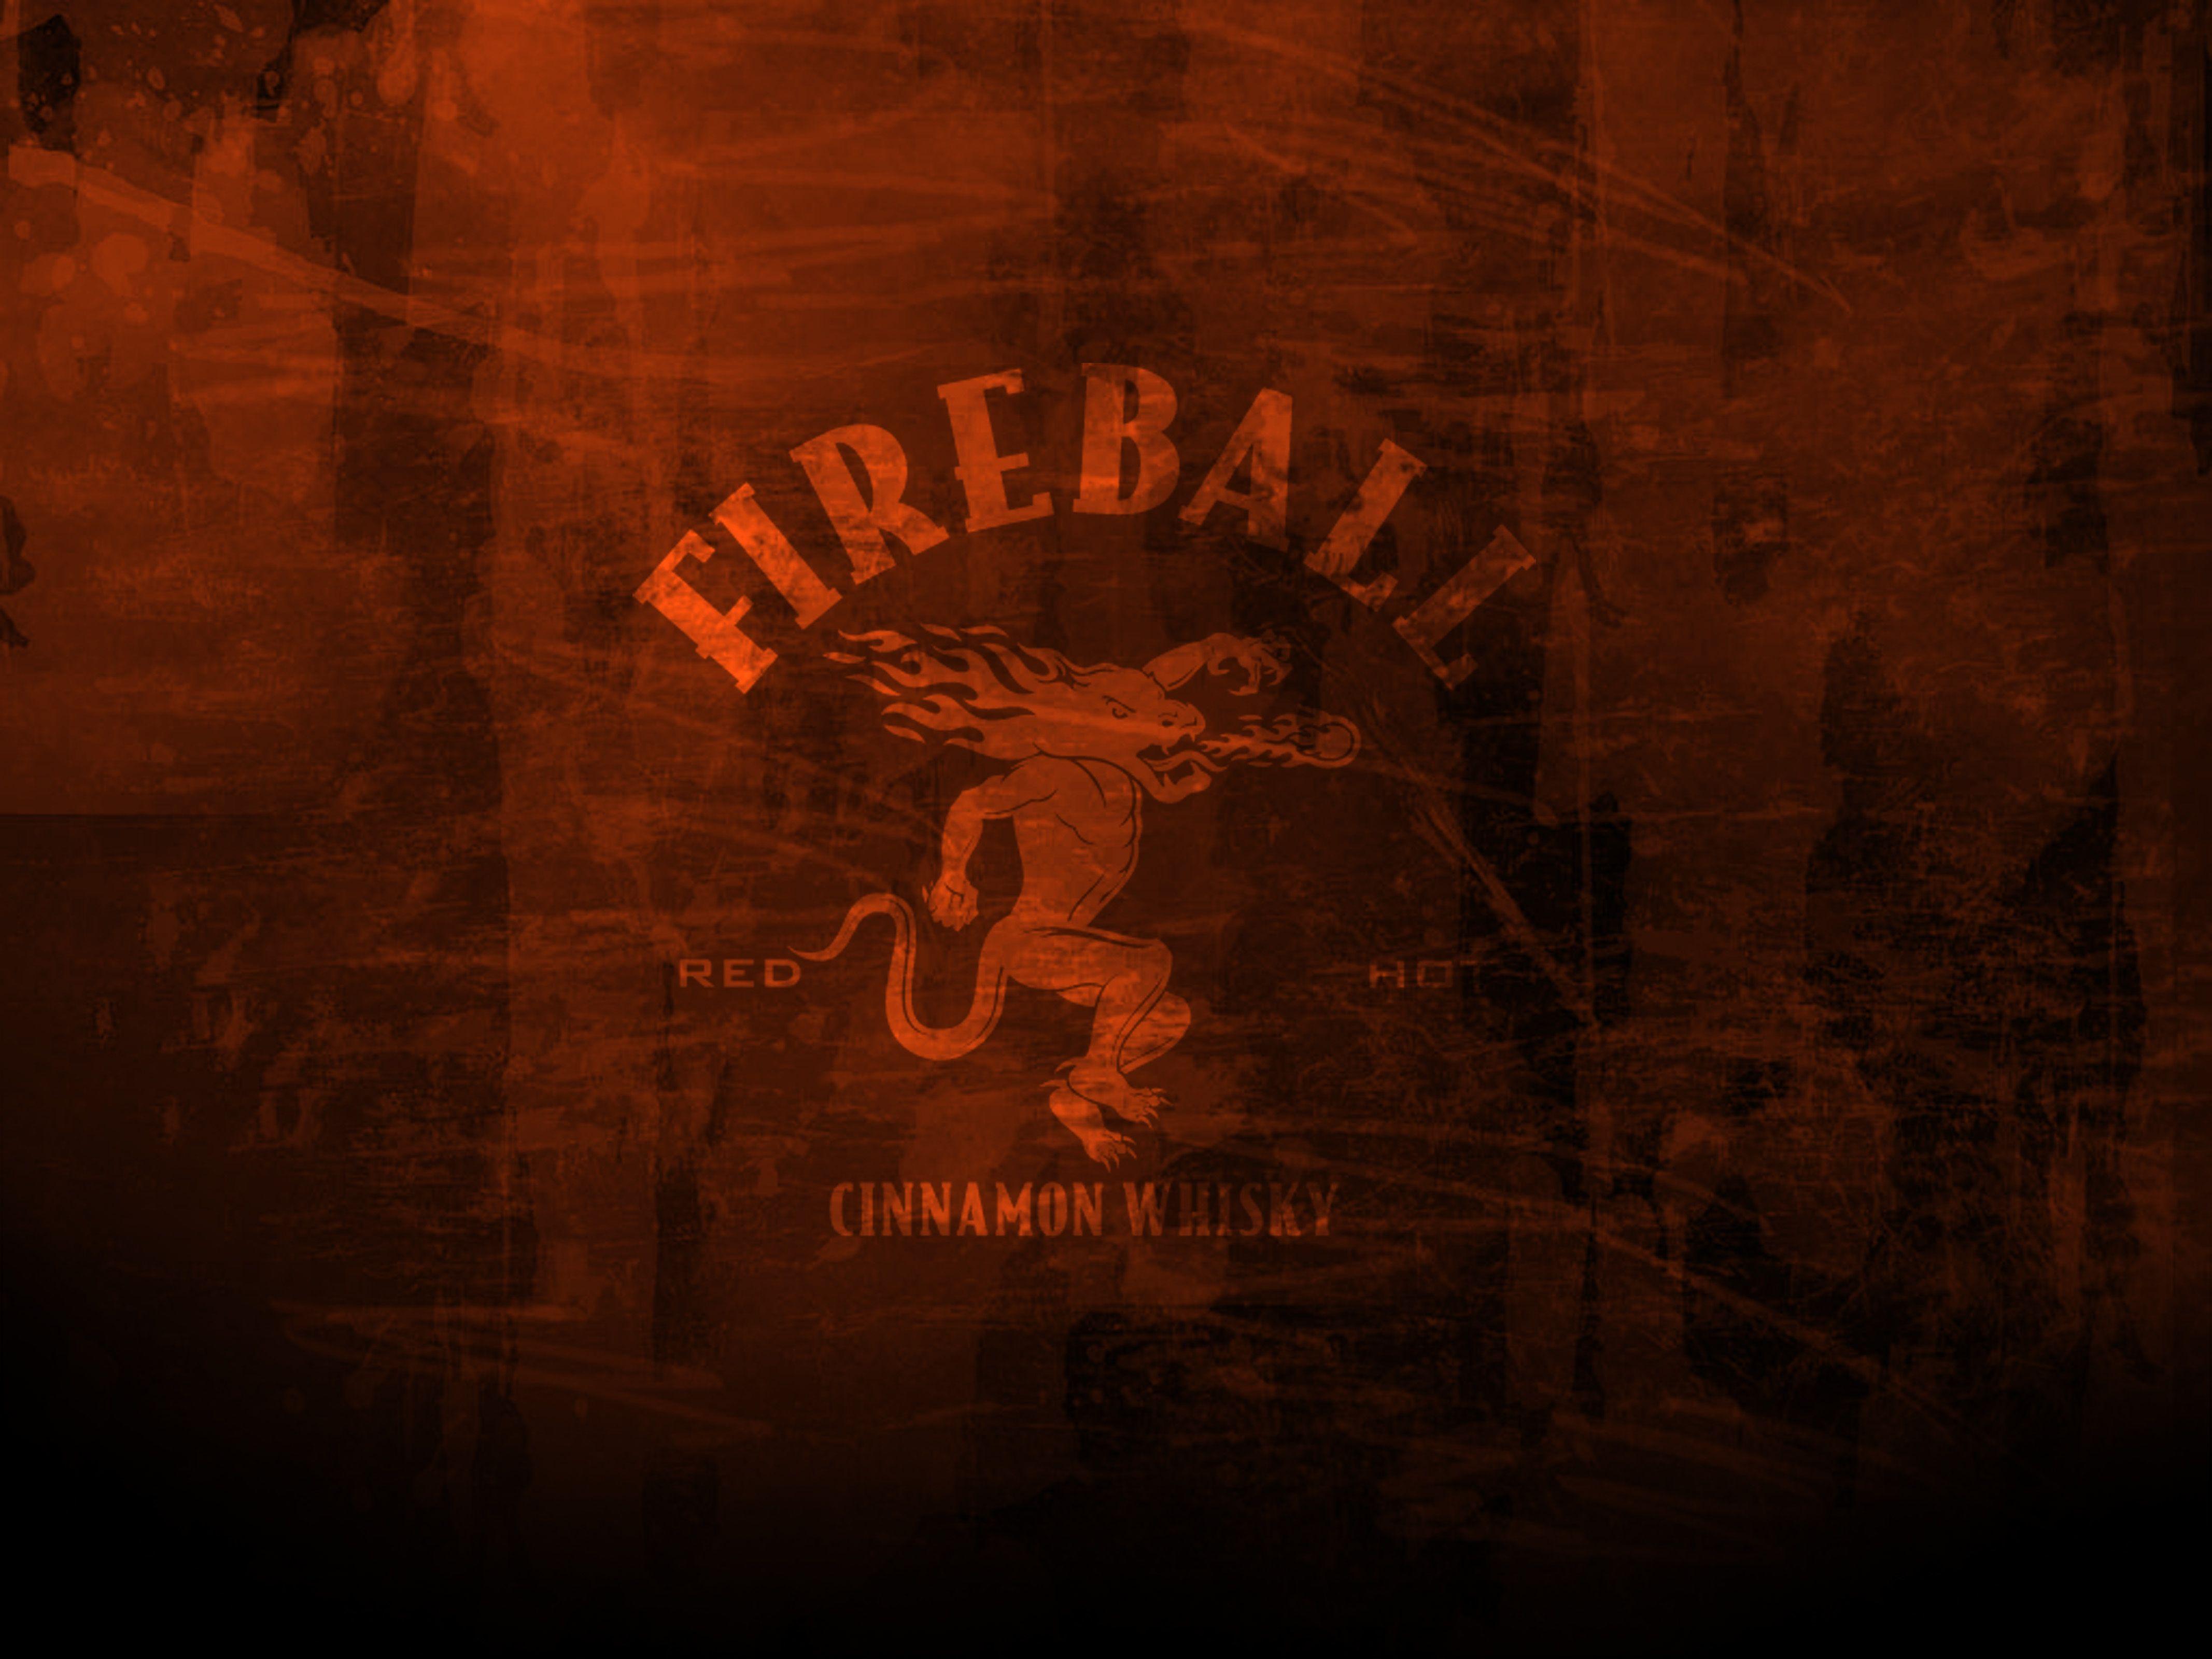 Fireball Whiskey Wallpaper Wallpaper Fireball whiskey Whiskey 4267x3200